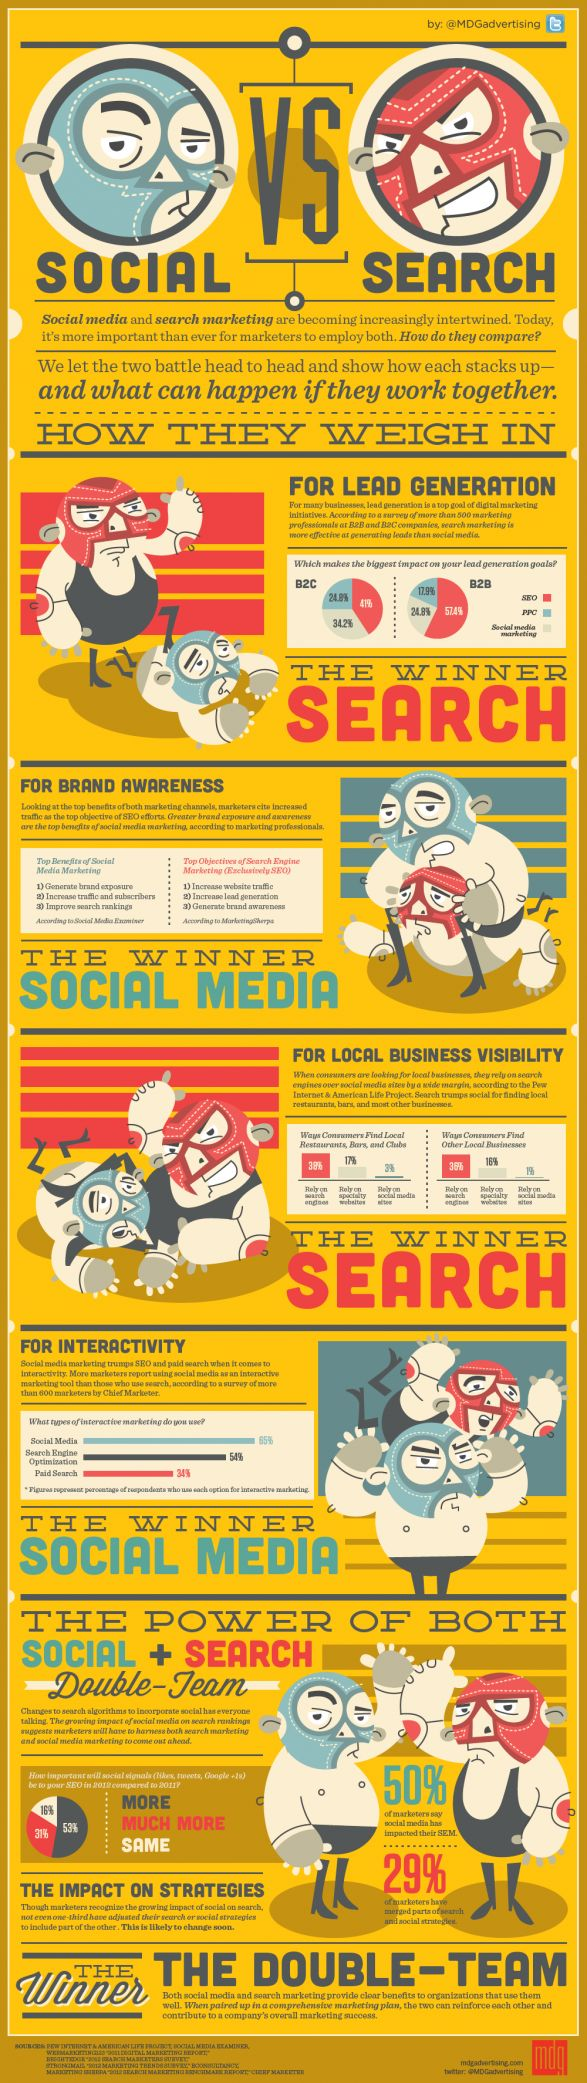 Social VS Search    Via MDG Advertising #Trada #SocialMedia #PPC #PaidSearch #marketing #SEM #AdWords #Business